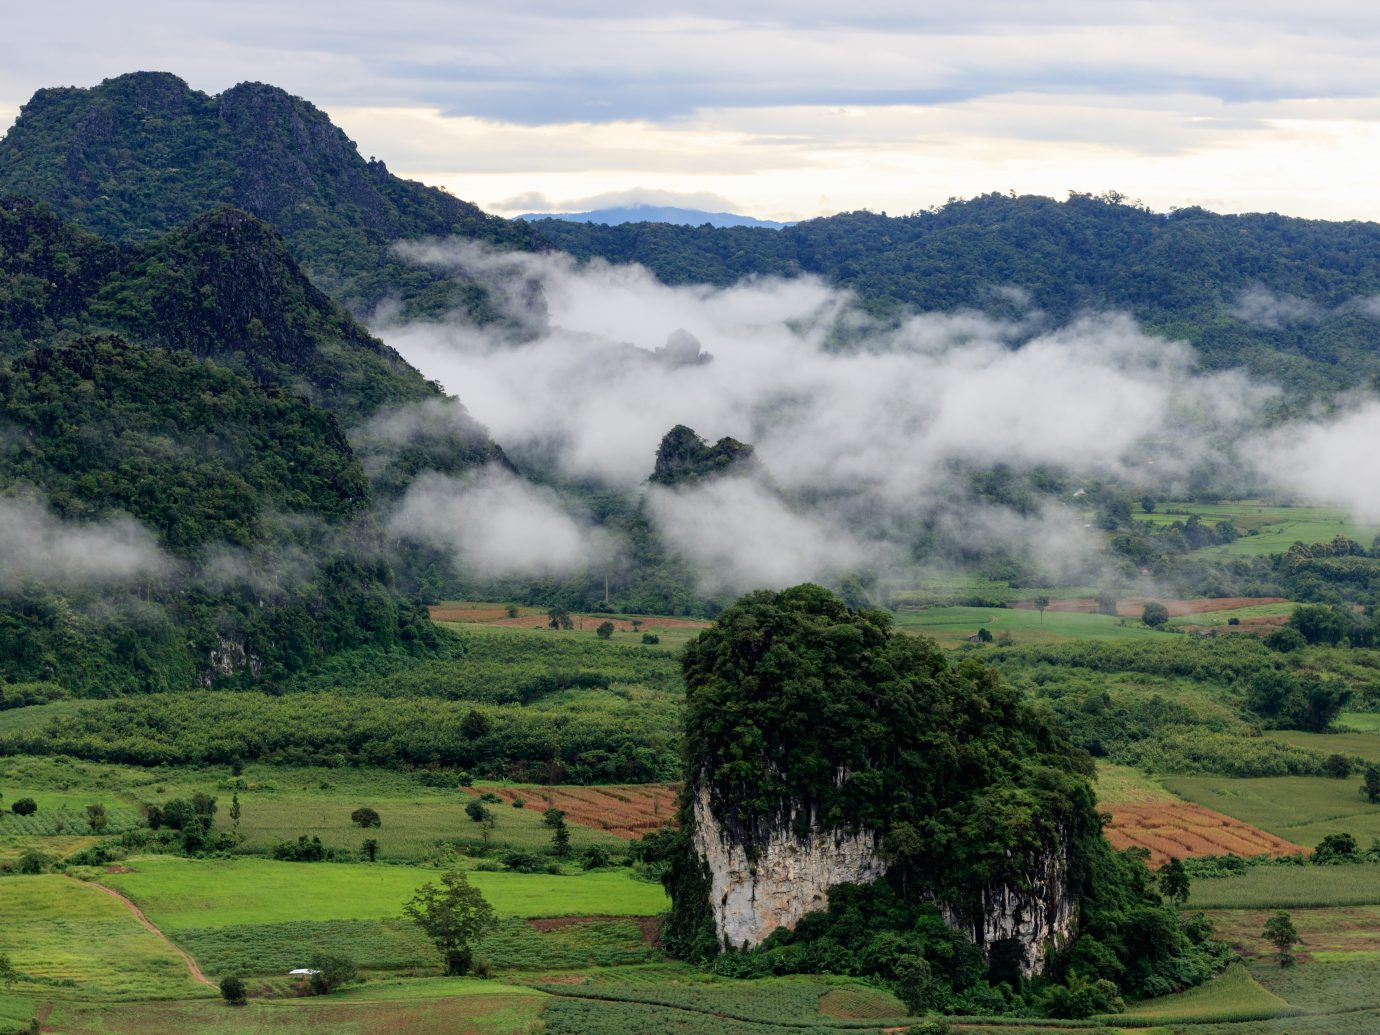 Mountain with fog in morning at Phu langka viewpoint, Phayao, Thailand.